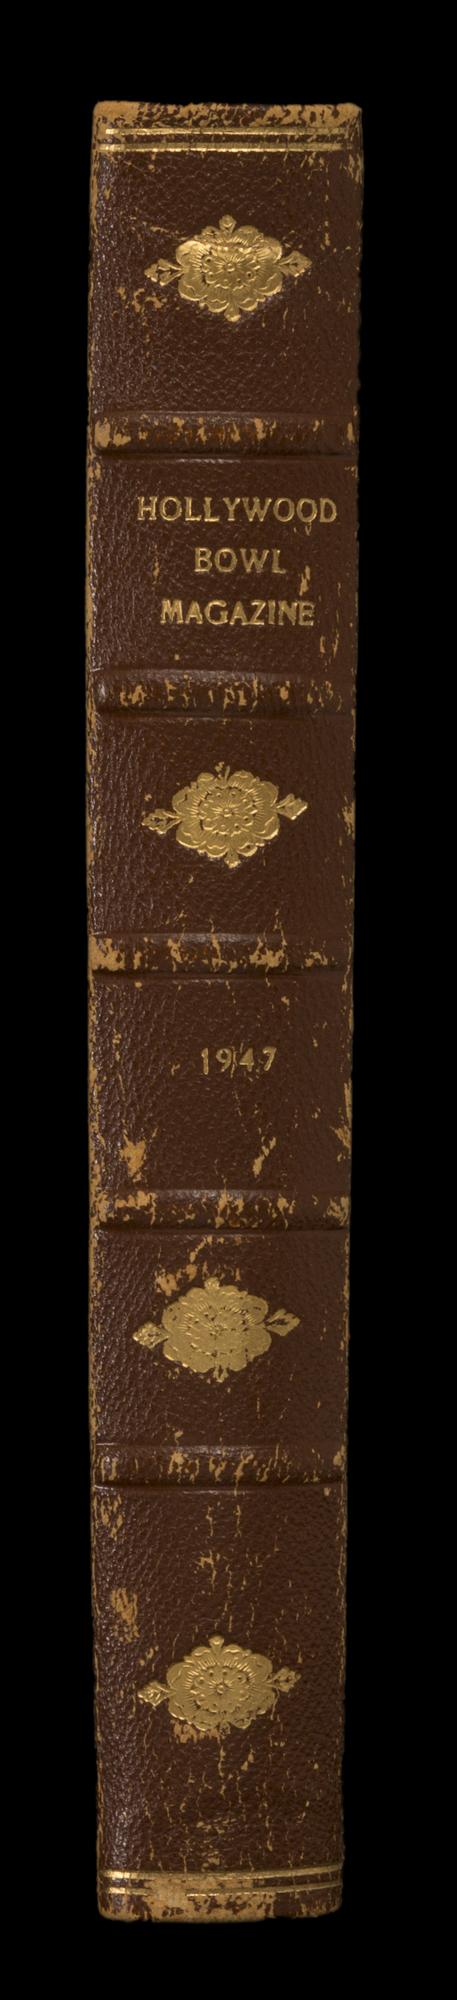 HB_ProgramBook_Spine_1947.jpg